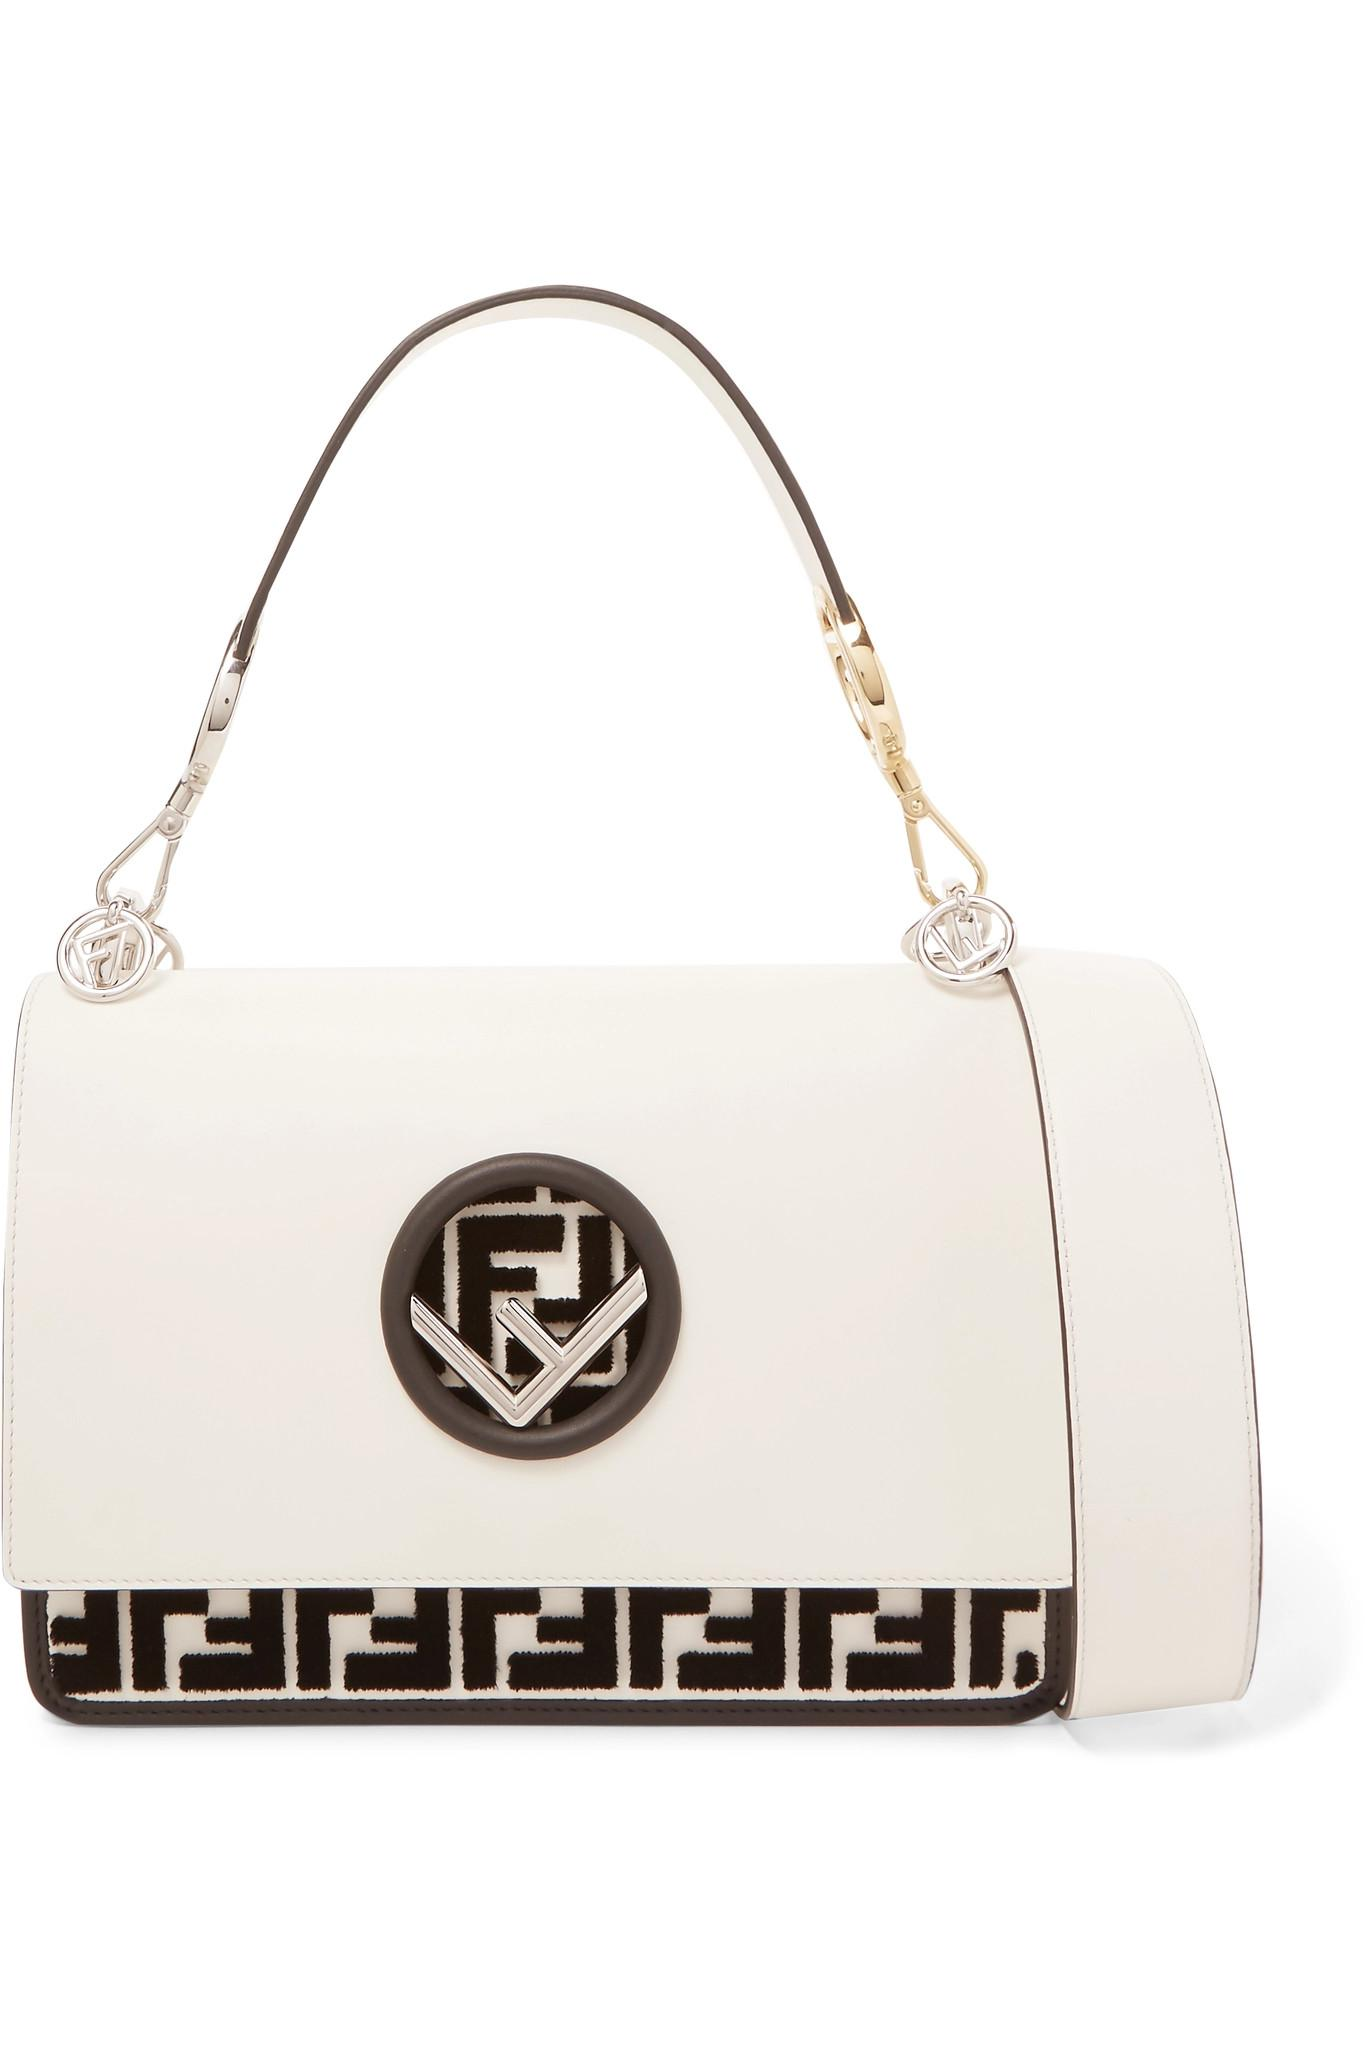 Lyst - Fendi Kan I Flocked Leather Shoulder Bag in White cd2d61c423b28